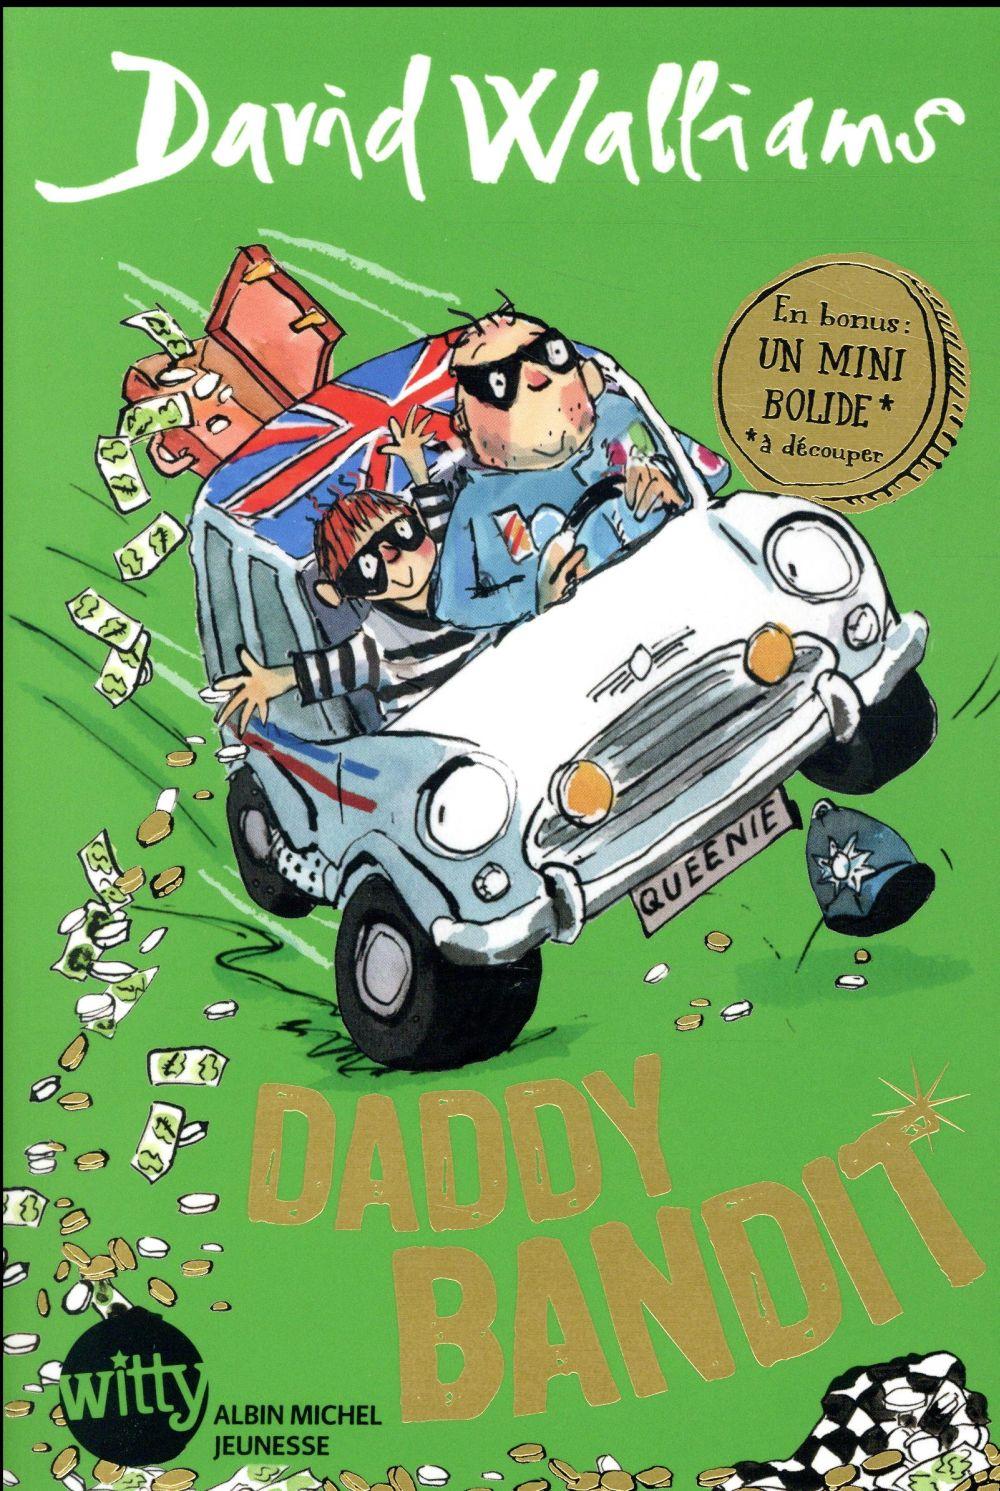 Daddy Bandit